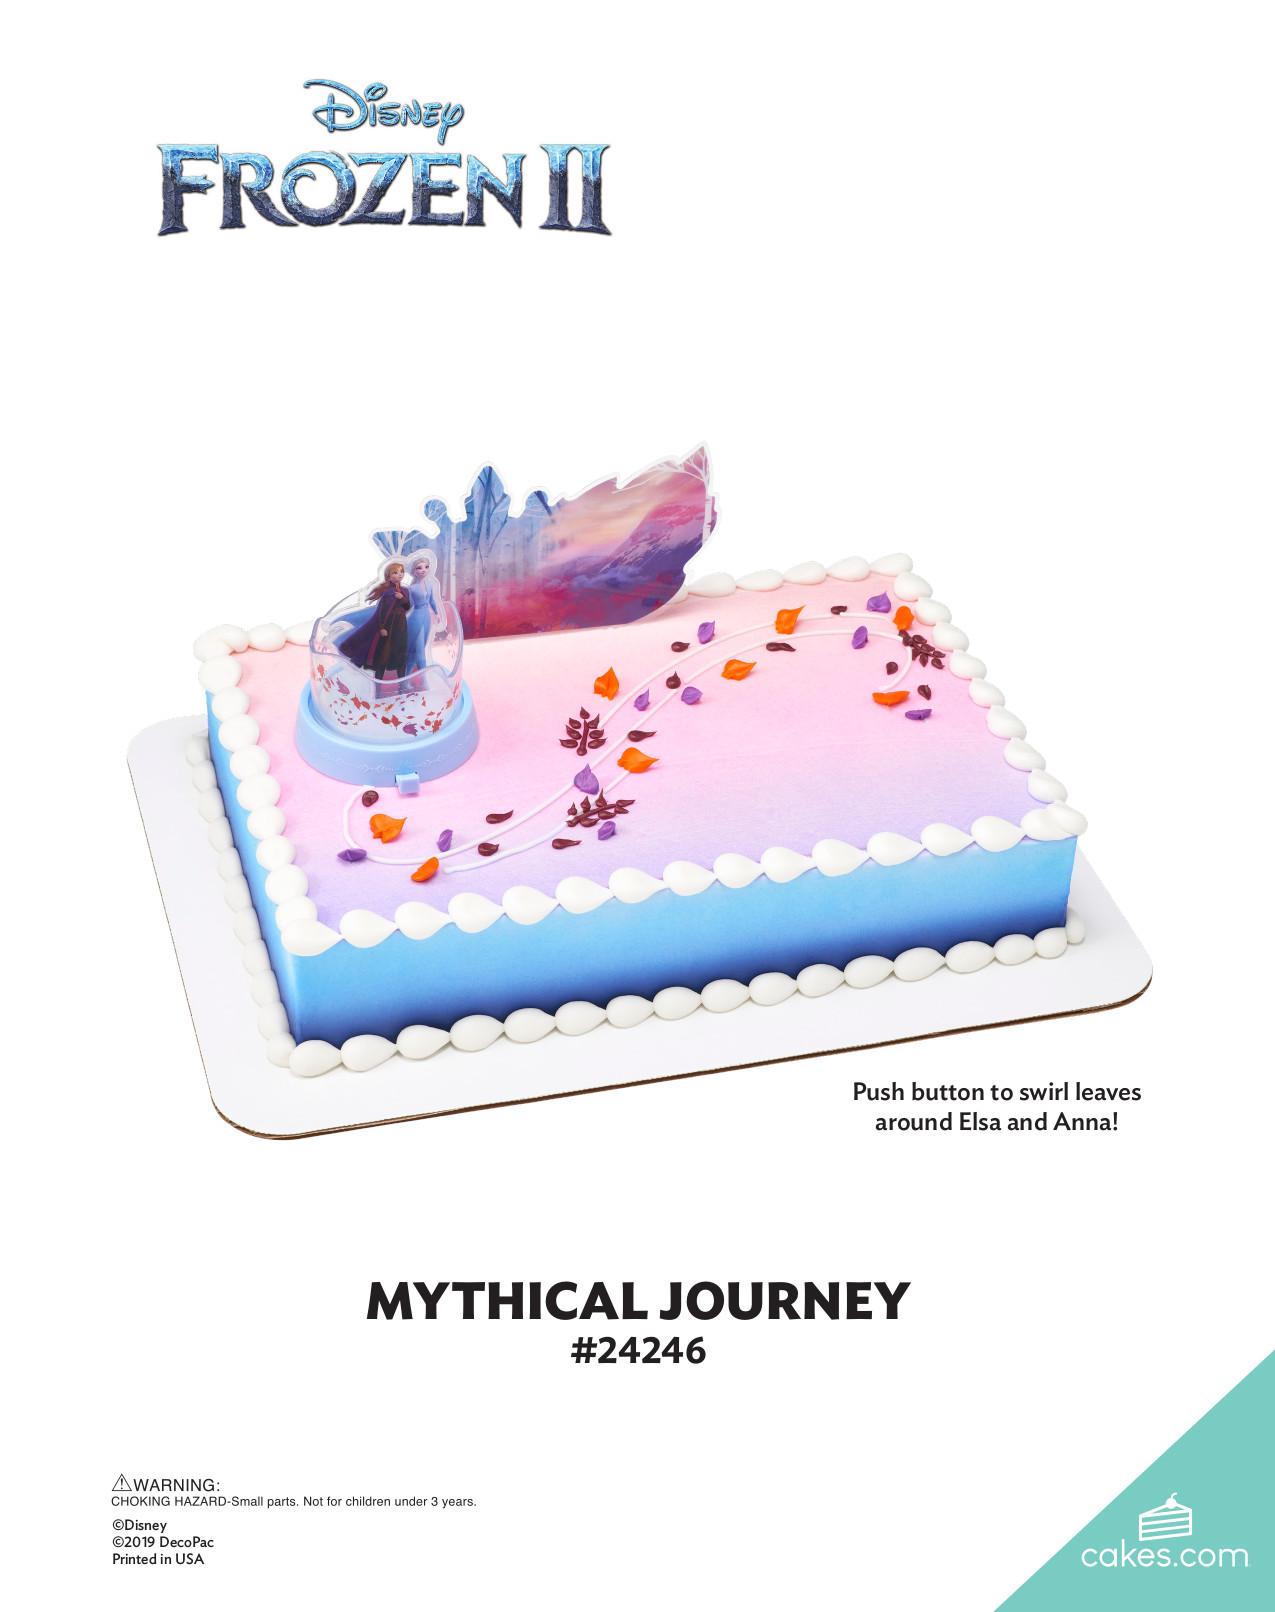 Disney Frozen Ii Mythical Journey The Magic Of Cakes